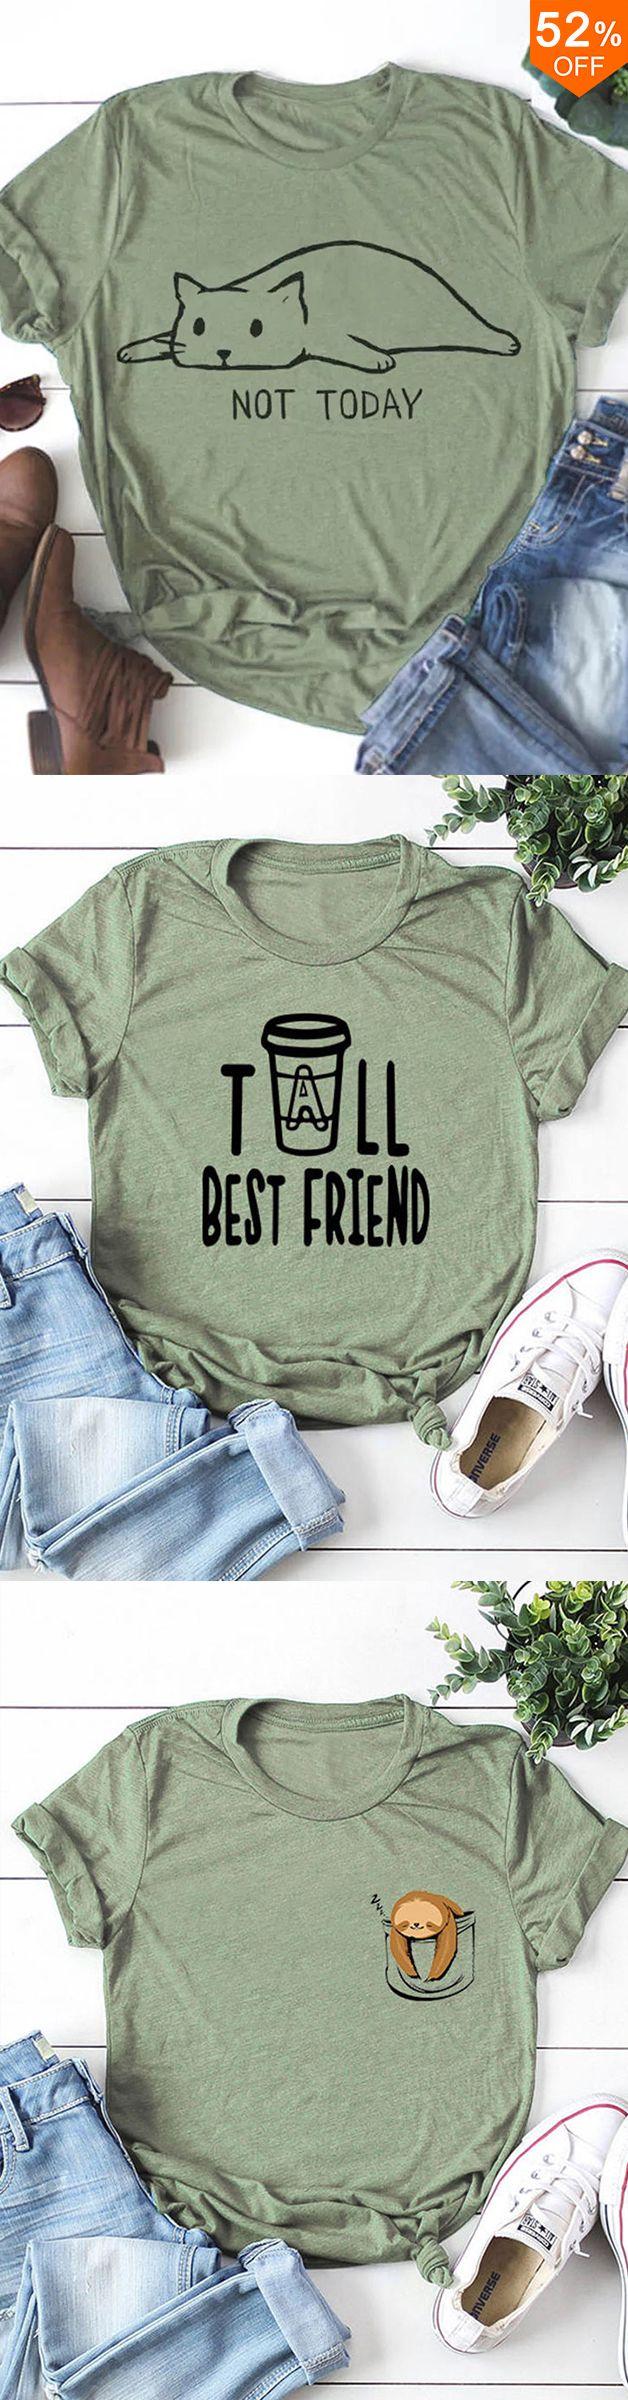 Cat Print Crew Neck Short Sleeve Cotton T-shirts 5